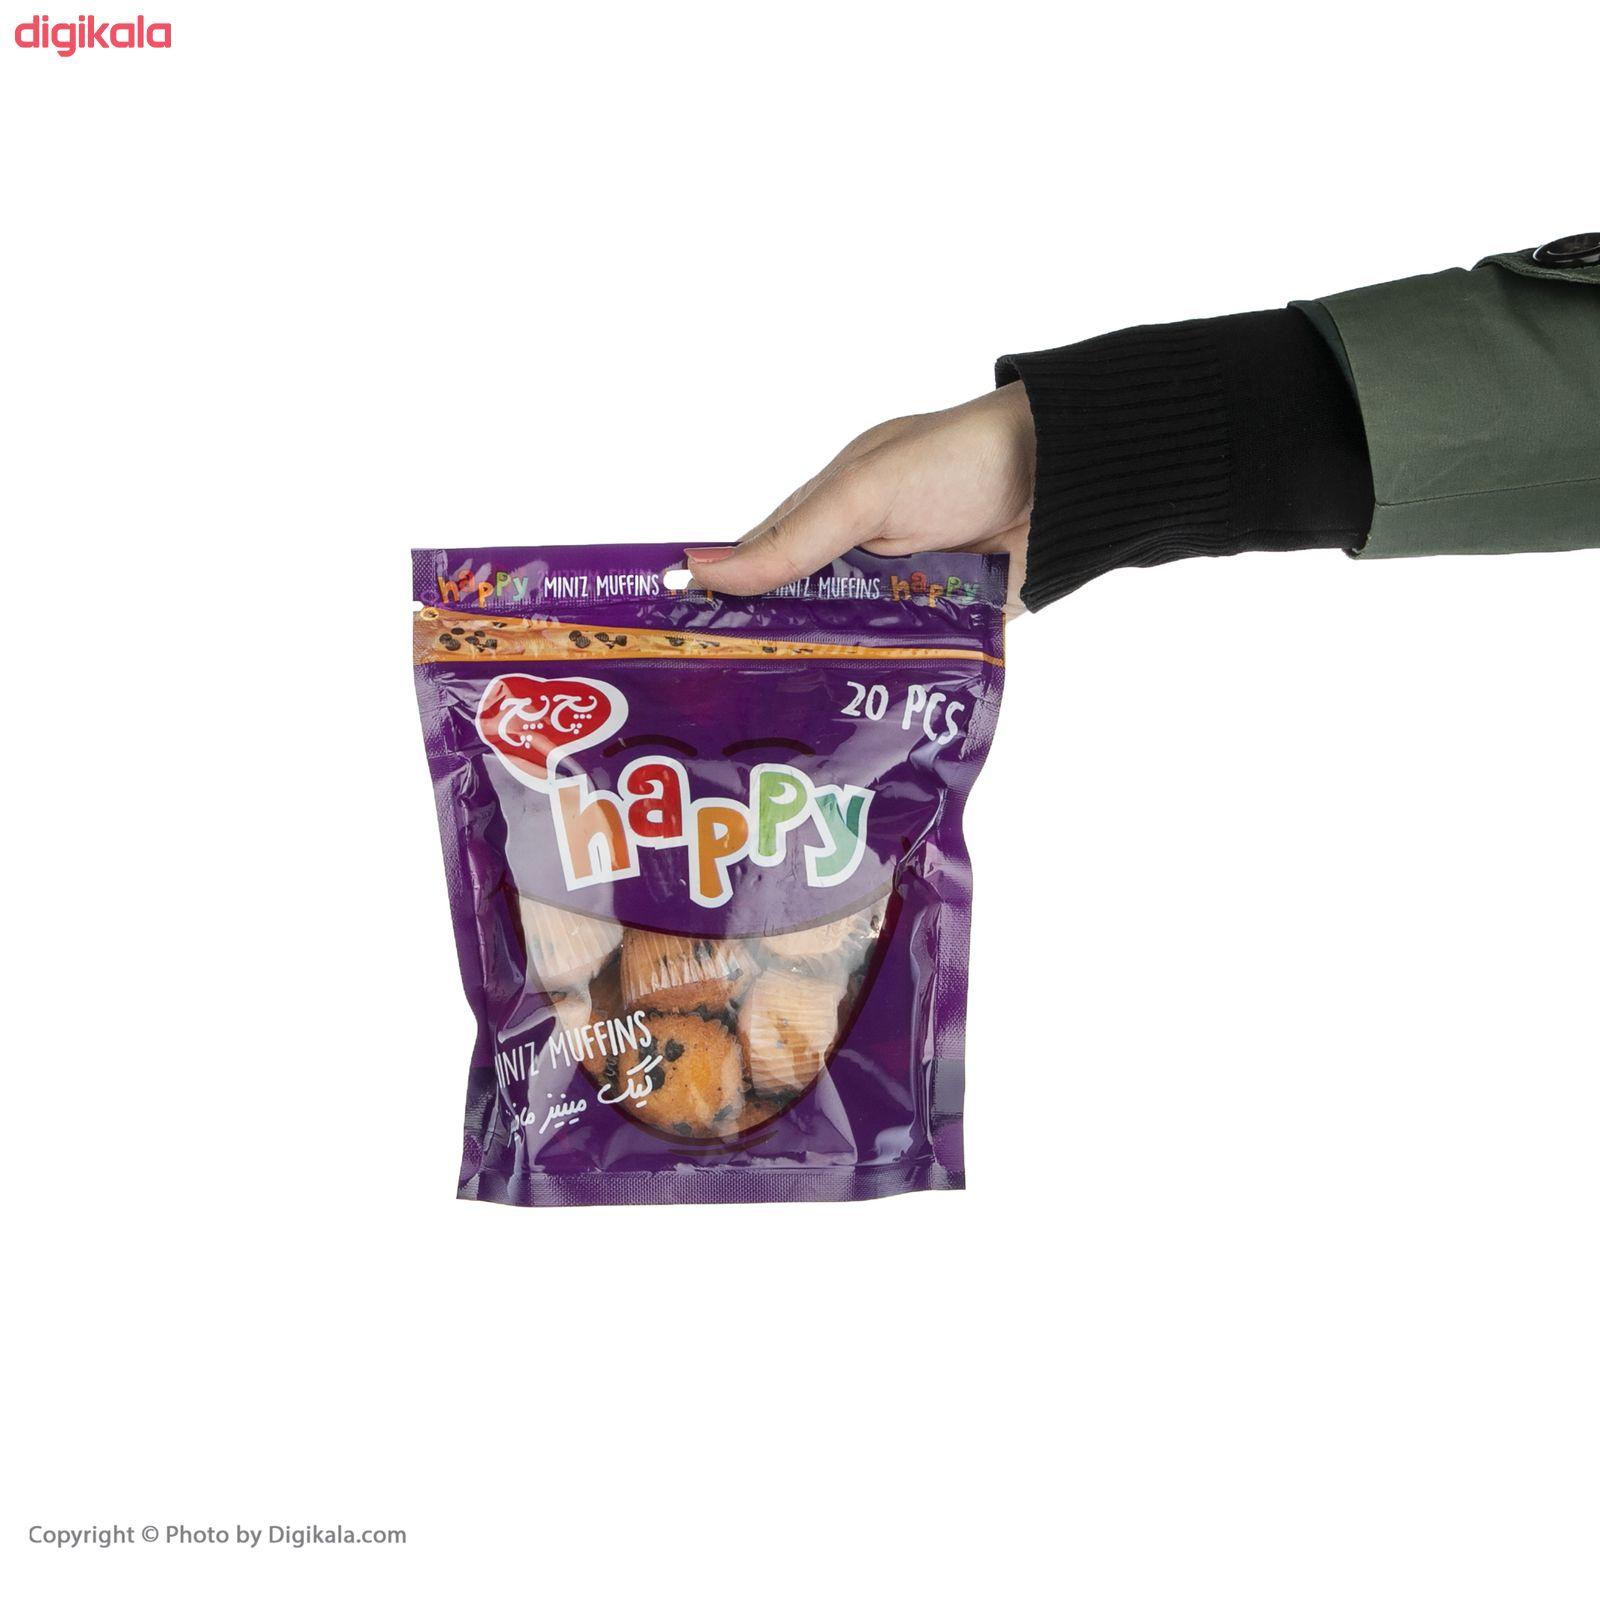 کیک مینیز مافینز پچ پچ - 160 گرم  main 1 1